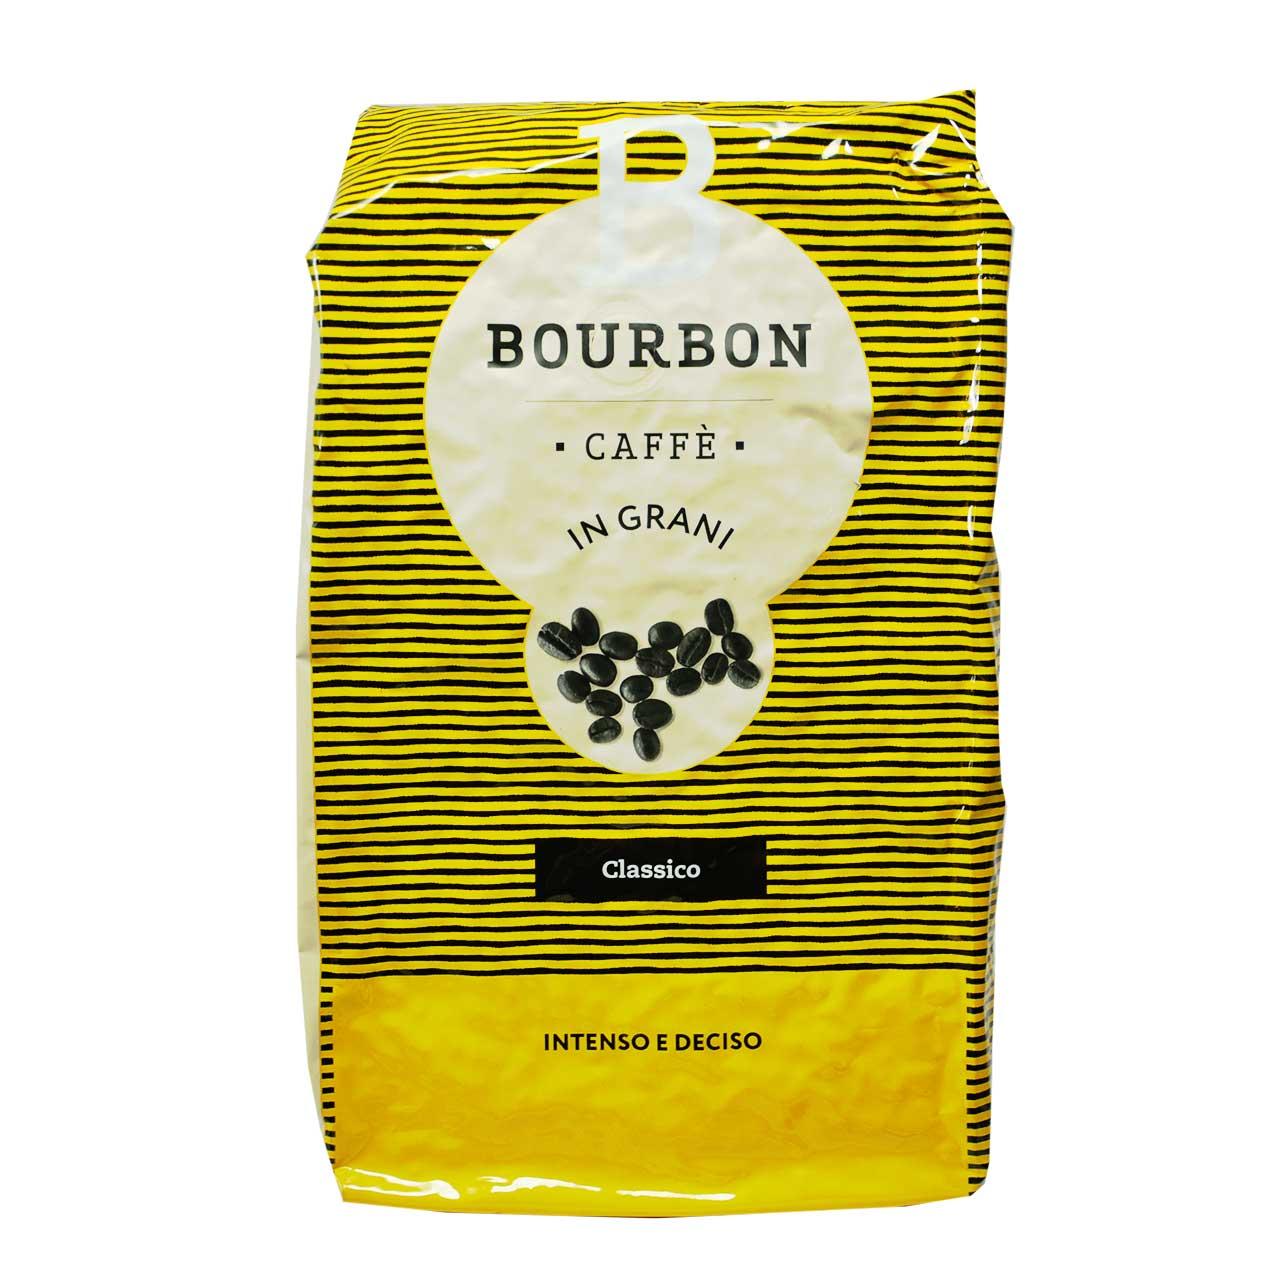 قهوه دان کلاسیکو بوربون – bourbon